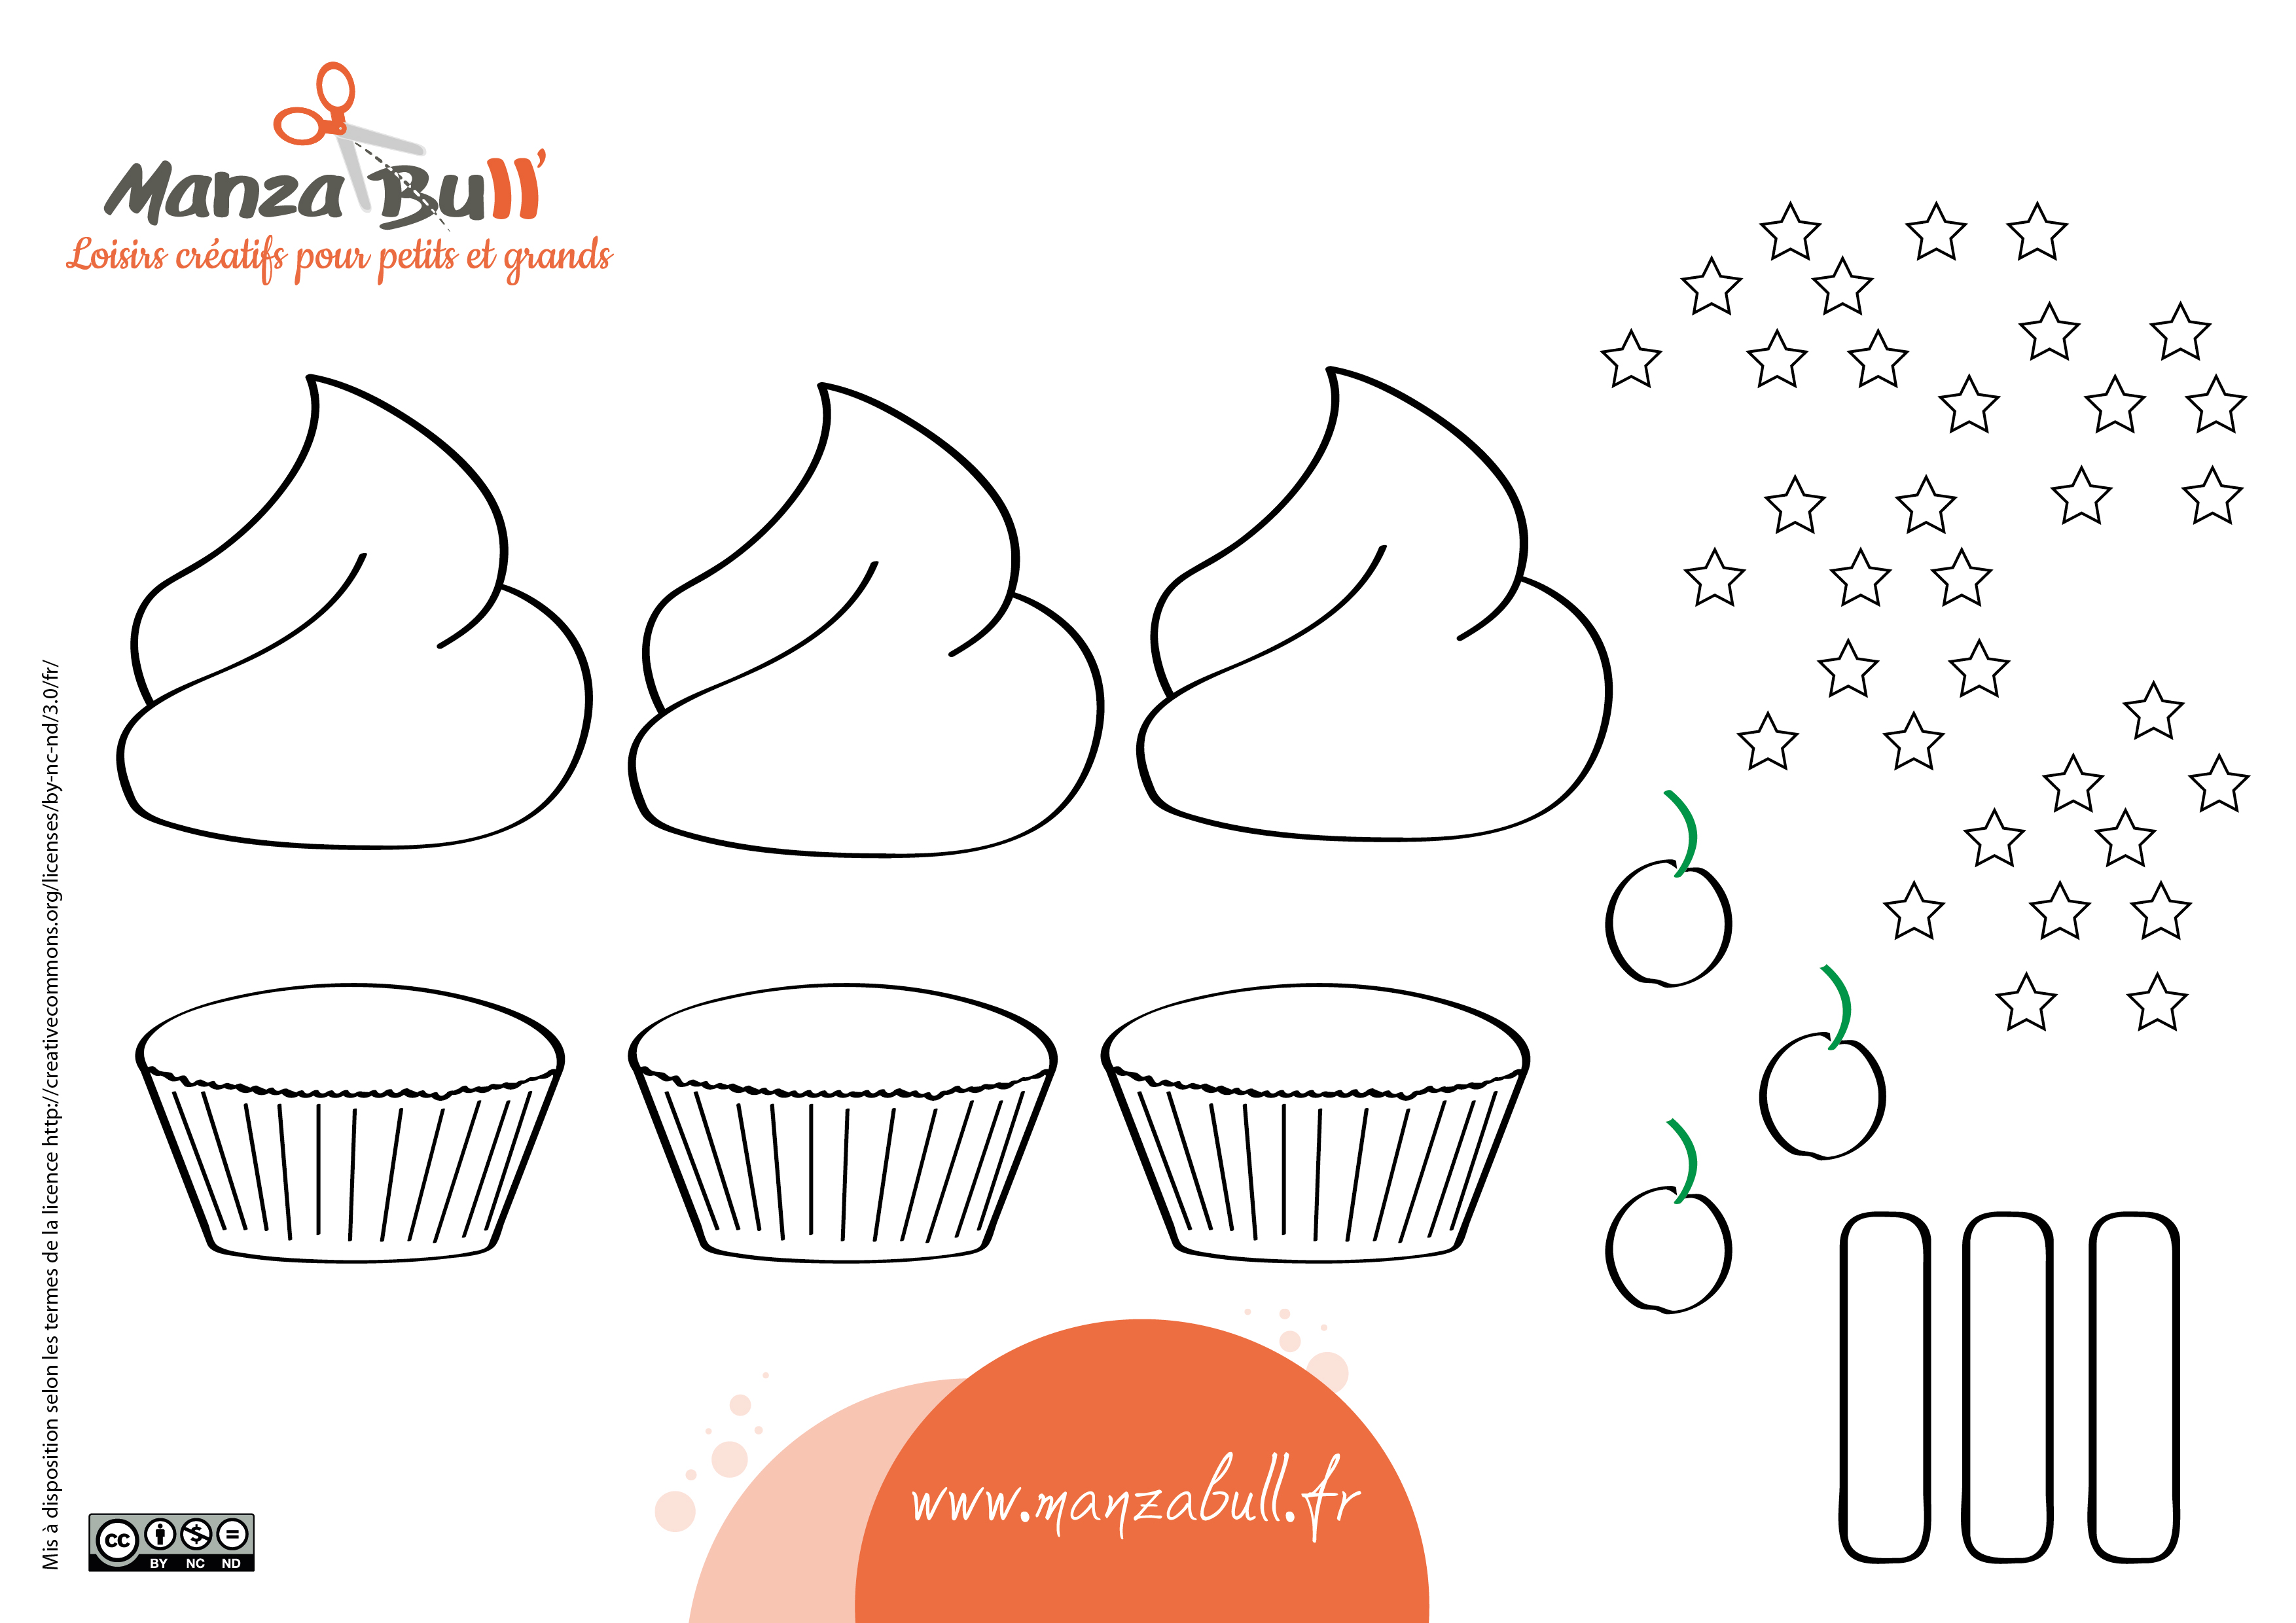 manzabull_cupcakes-02